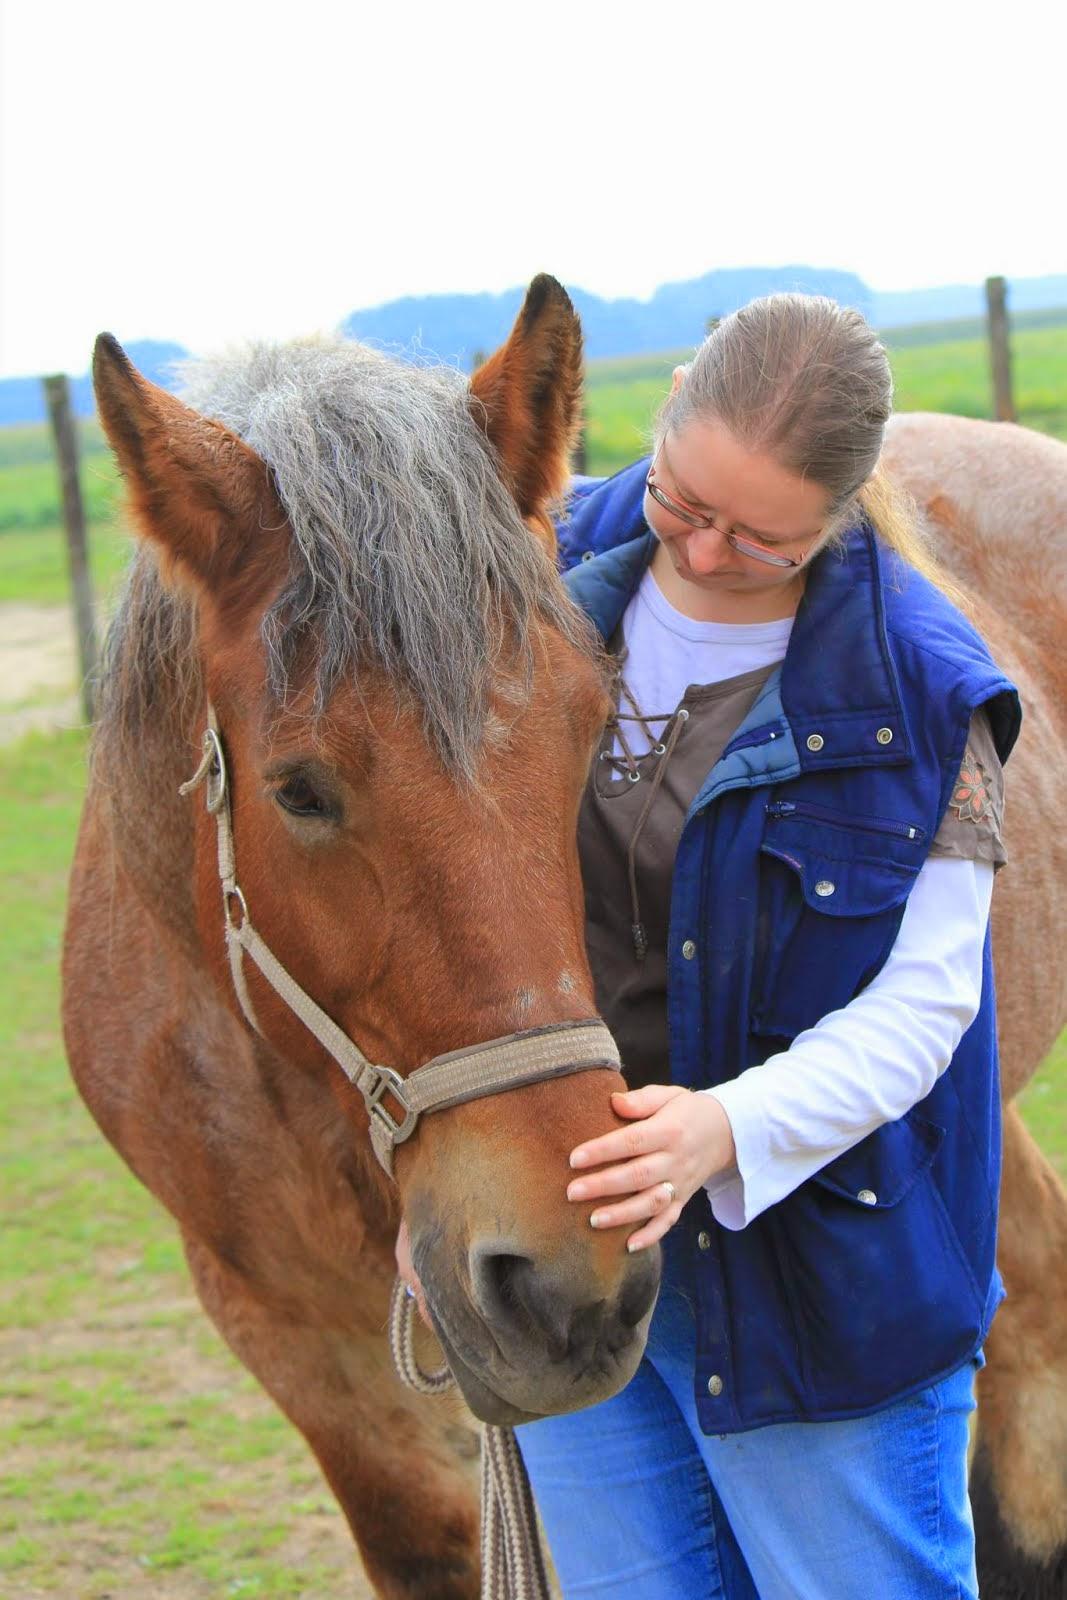 Betsie mijn paard